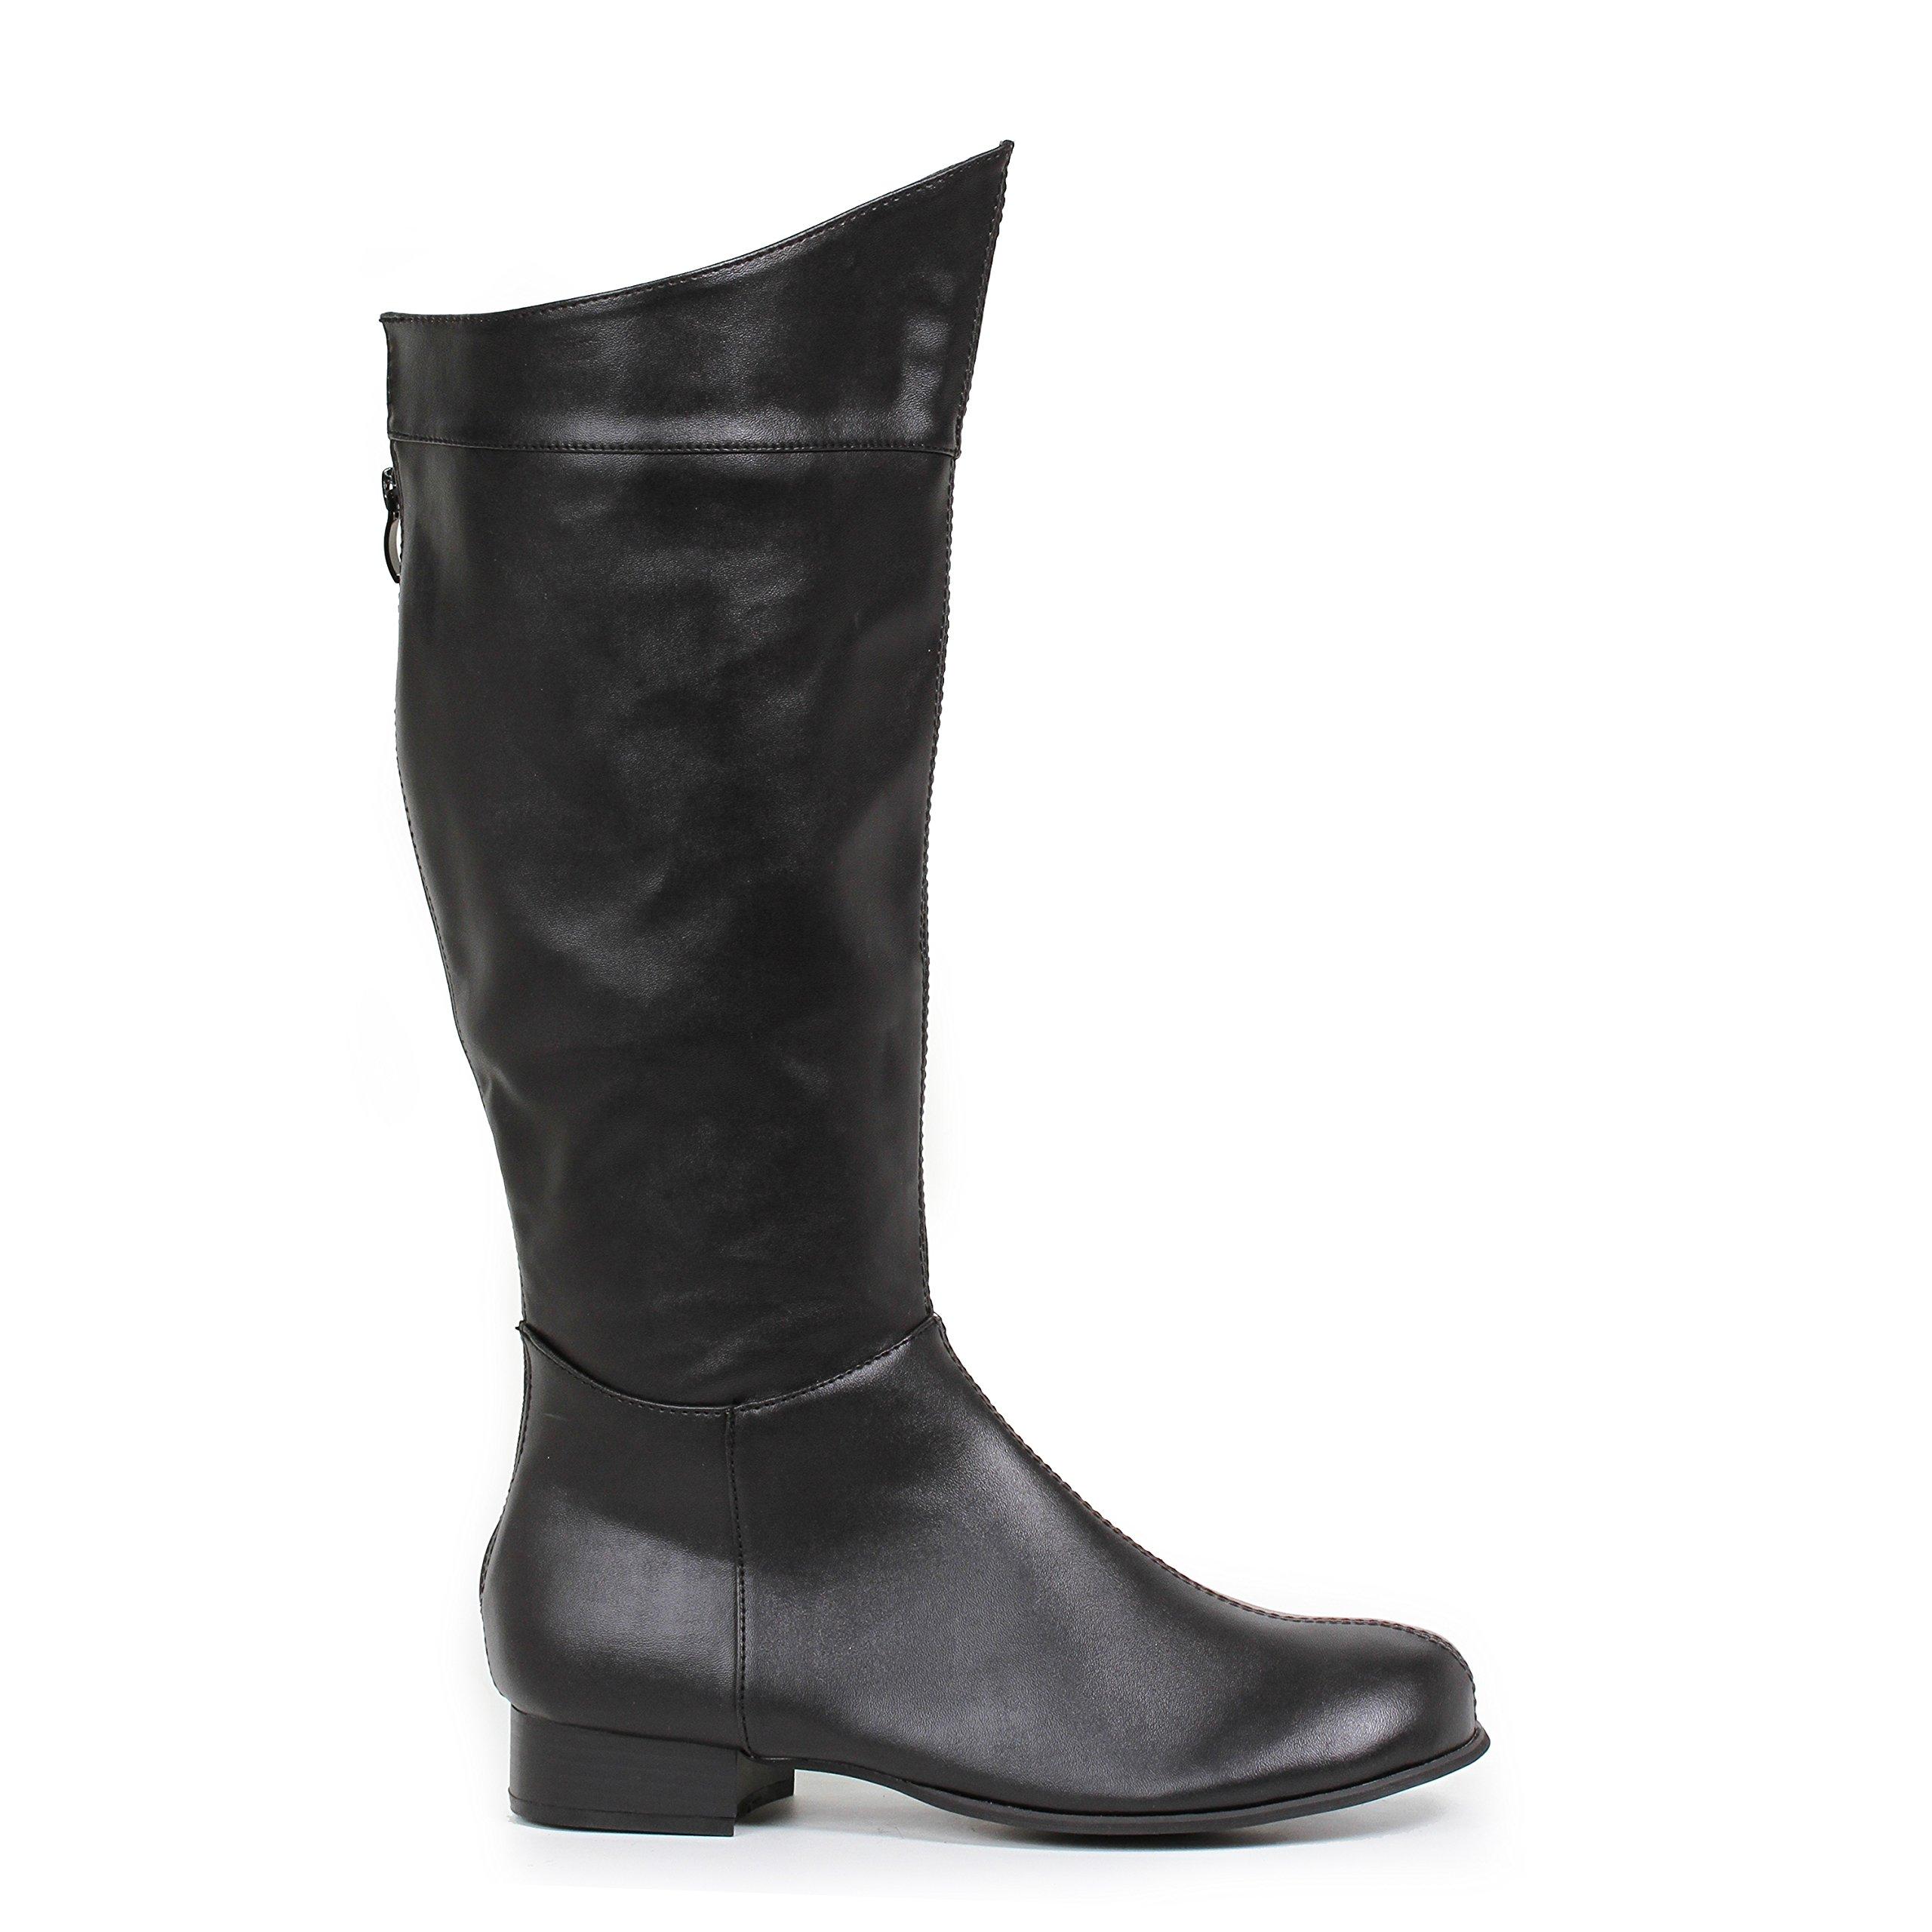 Ellie Shoes Men's 1''Heel Superhero Boot Sizes) M BLKP